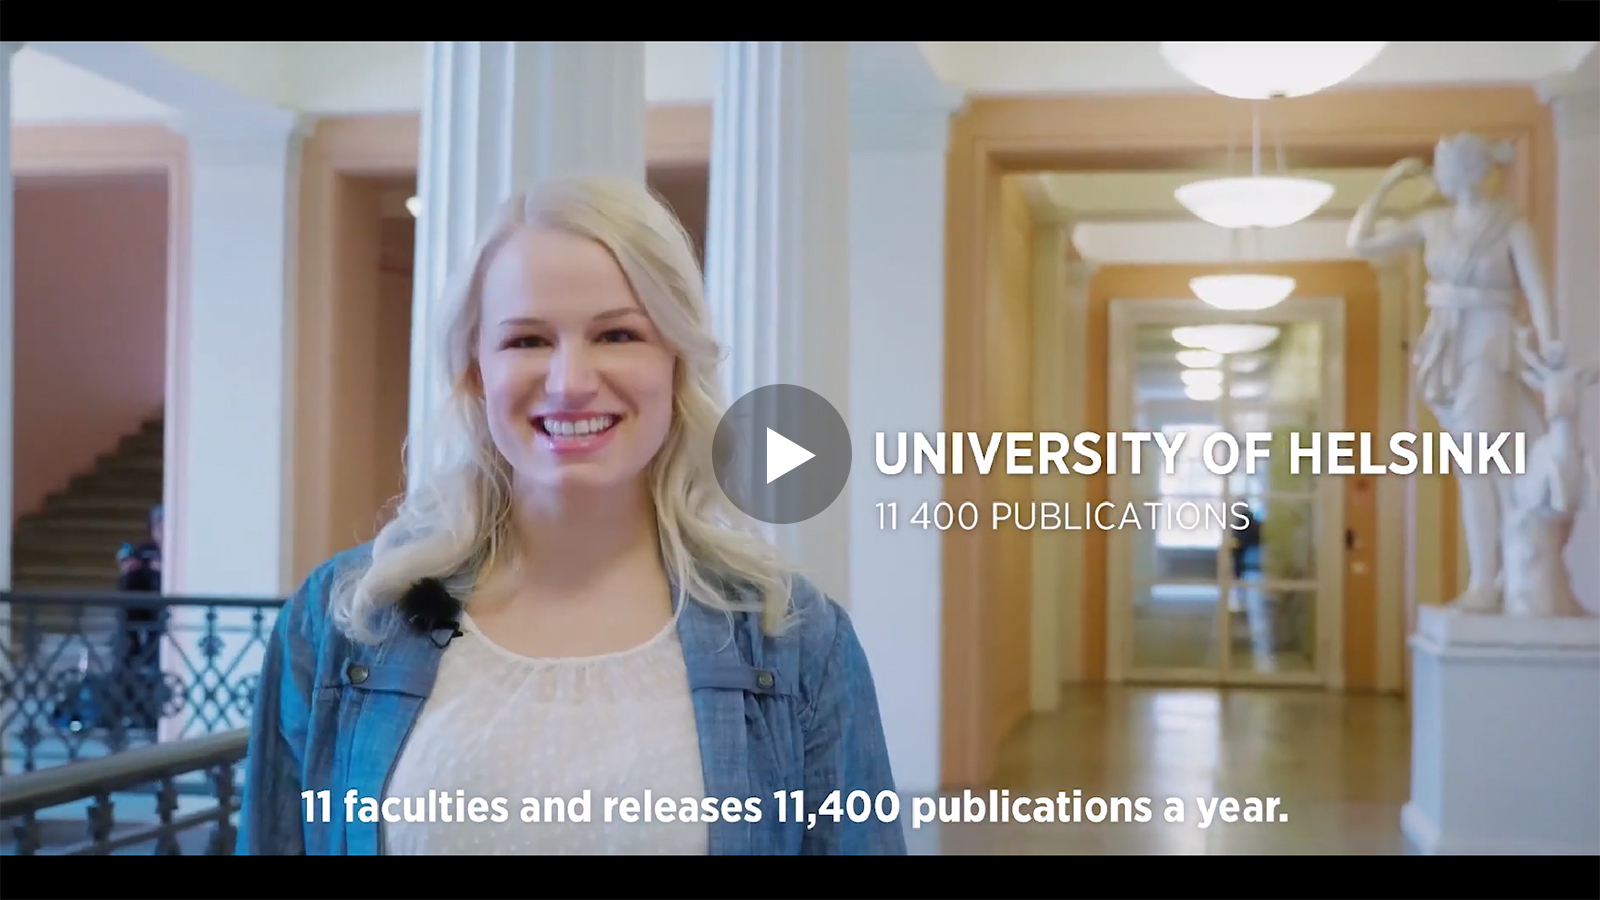 EUNIS 2020 video